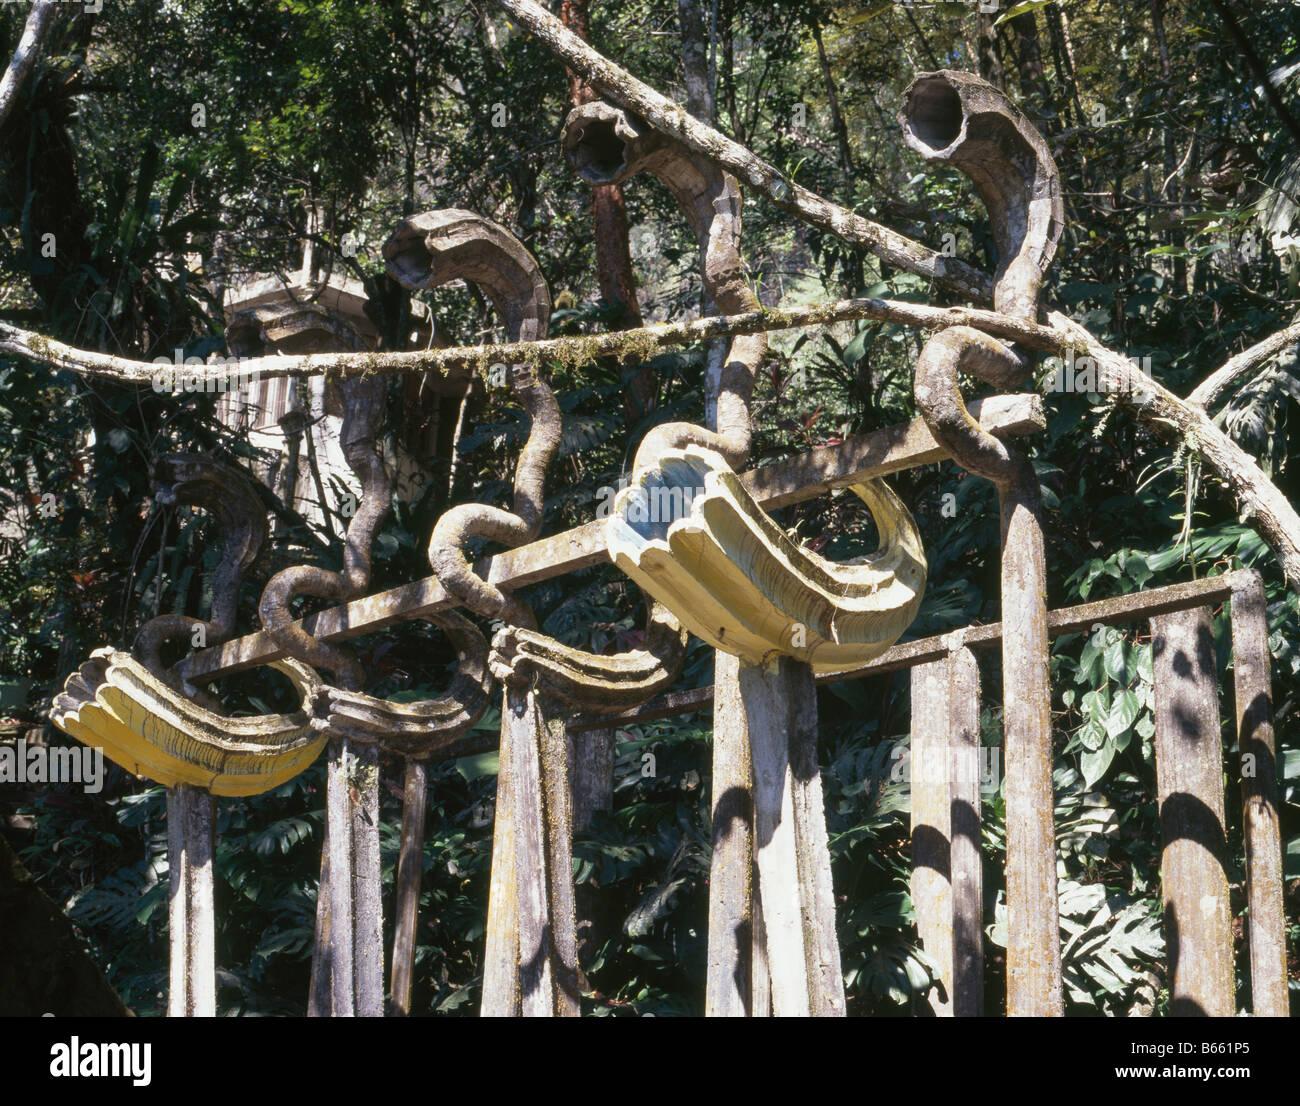 Las Pozas, Mexico. Sculpture With Horns cornucopia - Stock Image